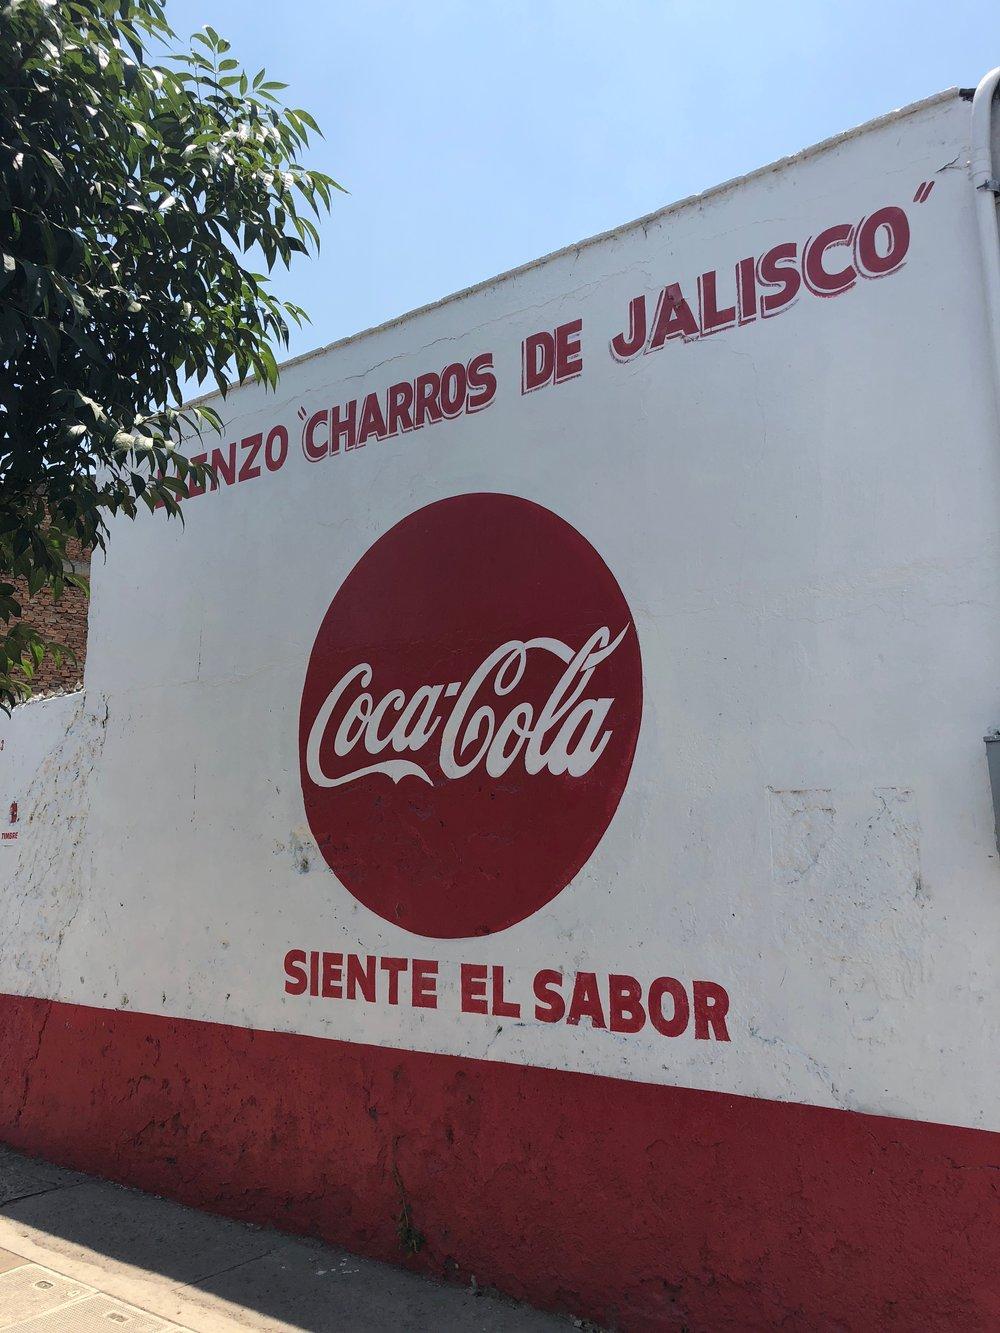 Guadalajara Charros.jpg